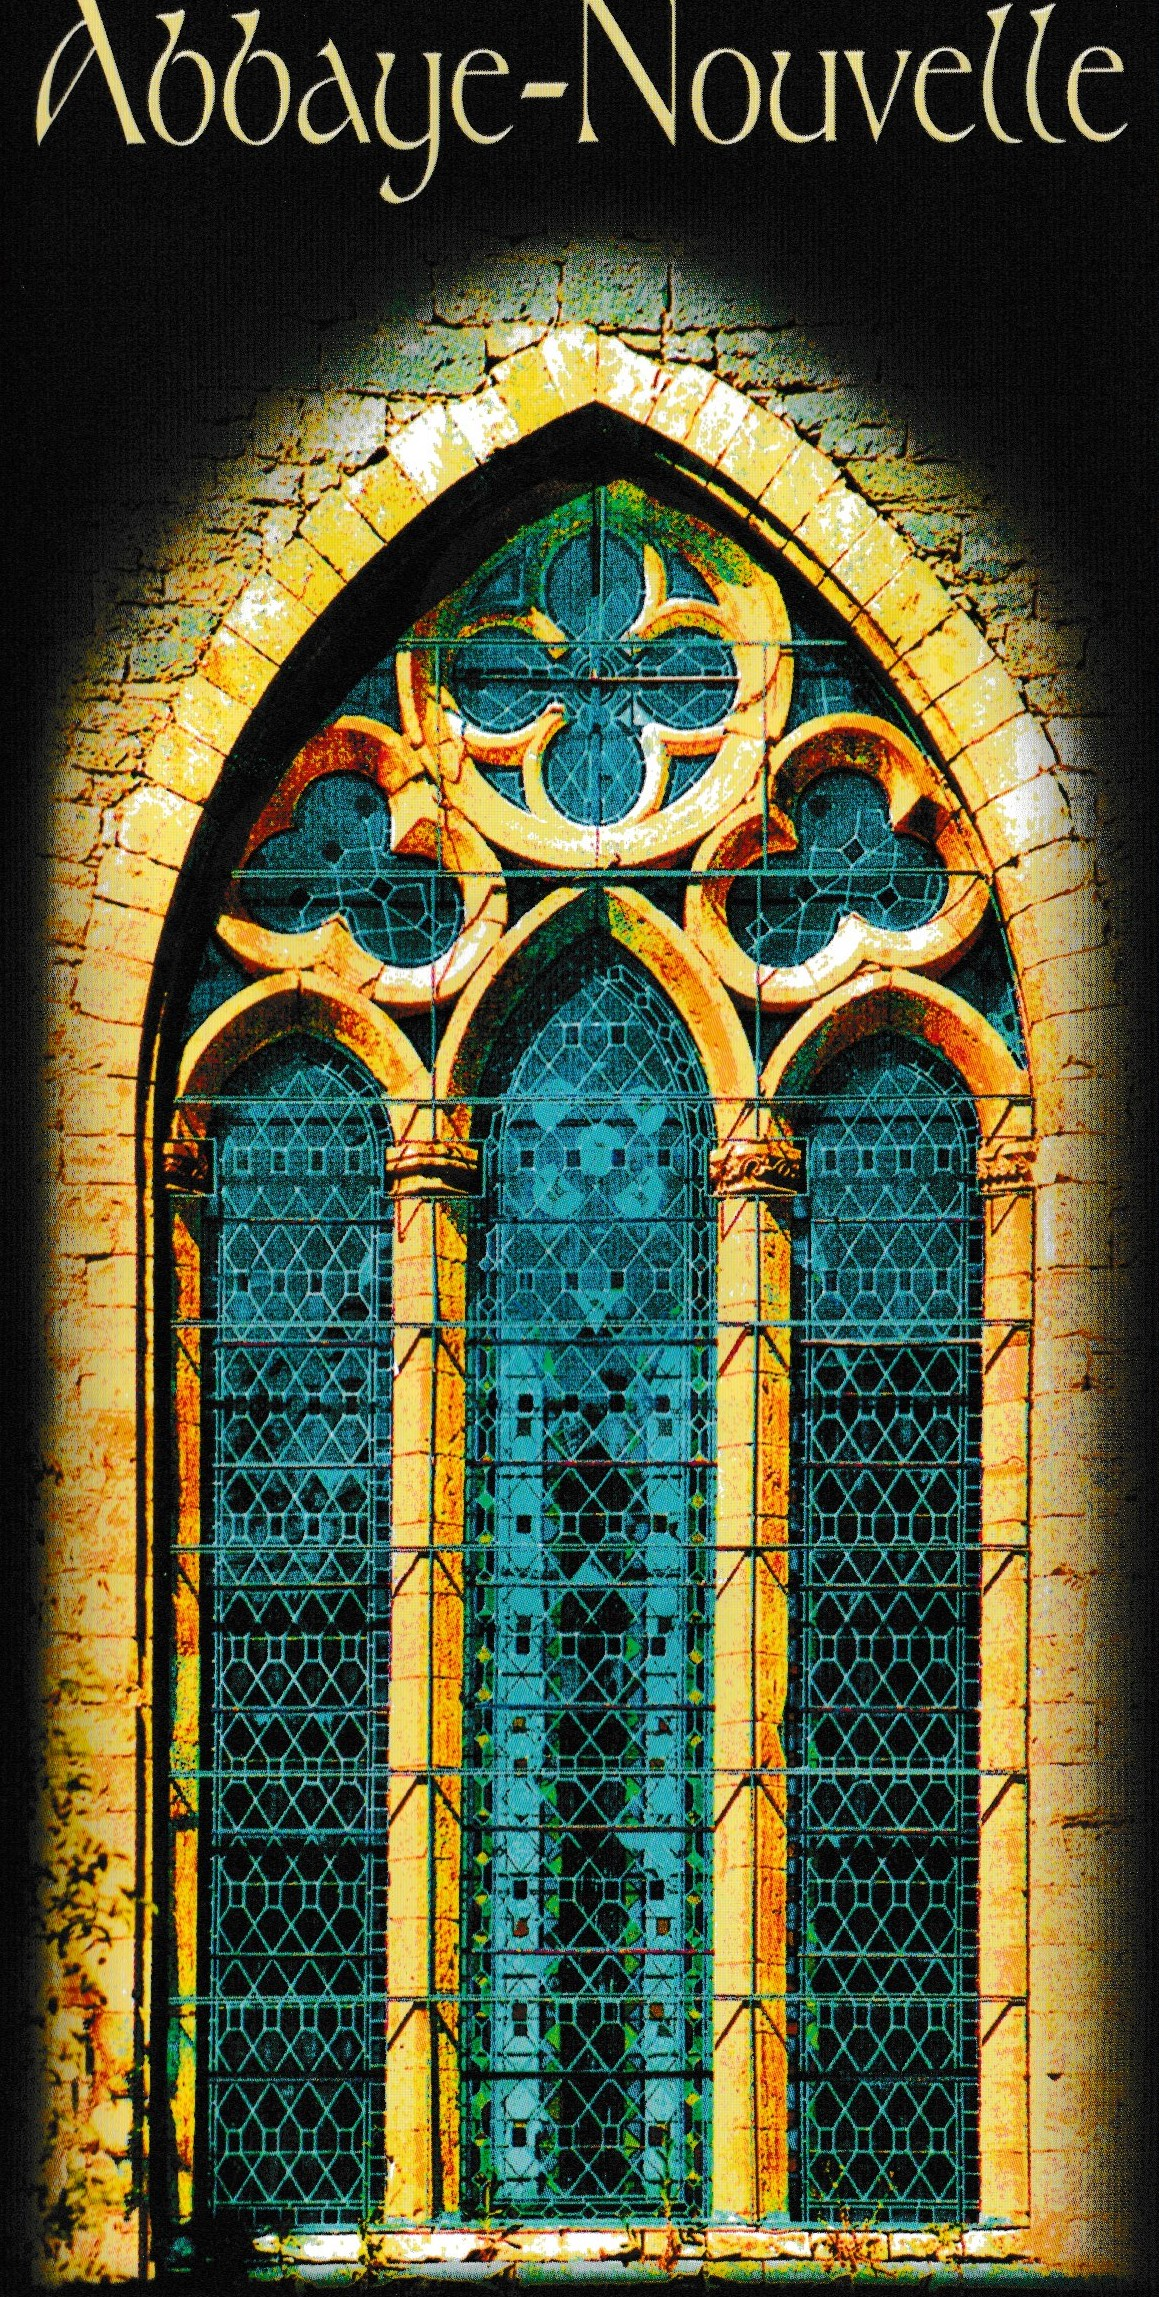 Abbaye-Nouvelle